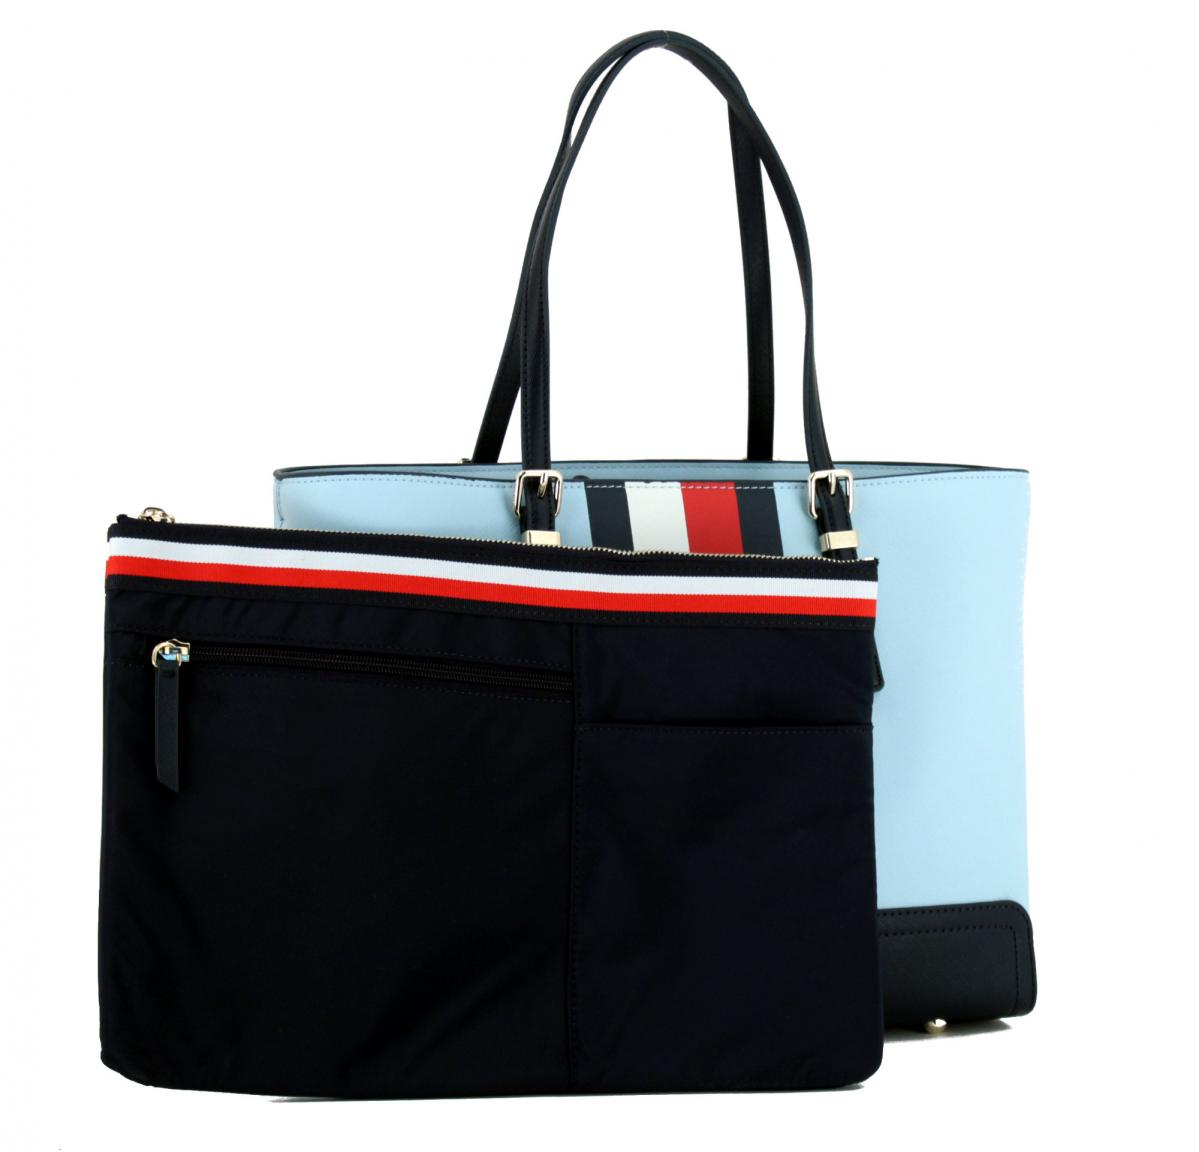 Medium Tote Bag Tommy Hilfiger Honey hellgelb blau Laptopfach